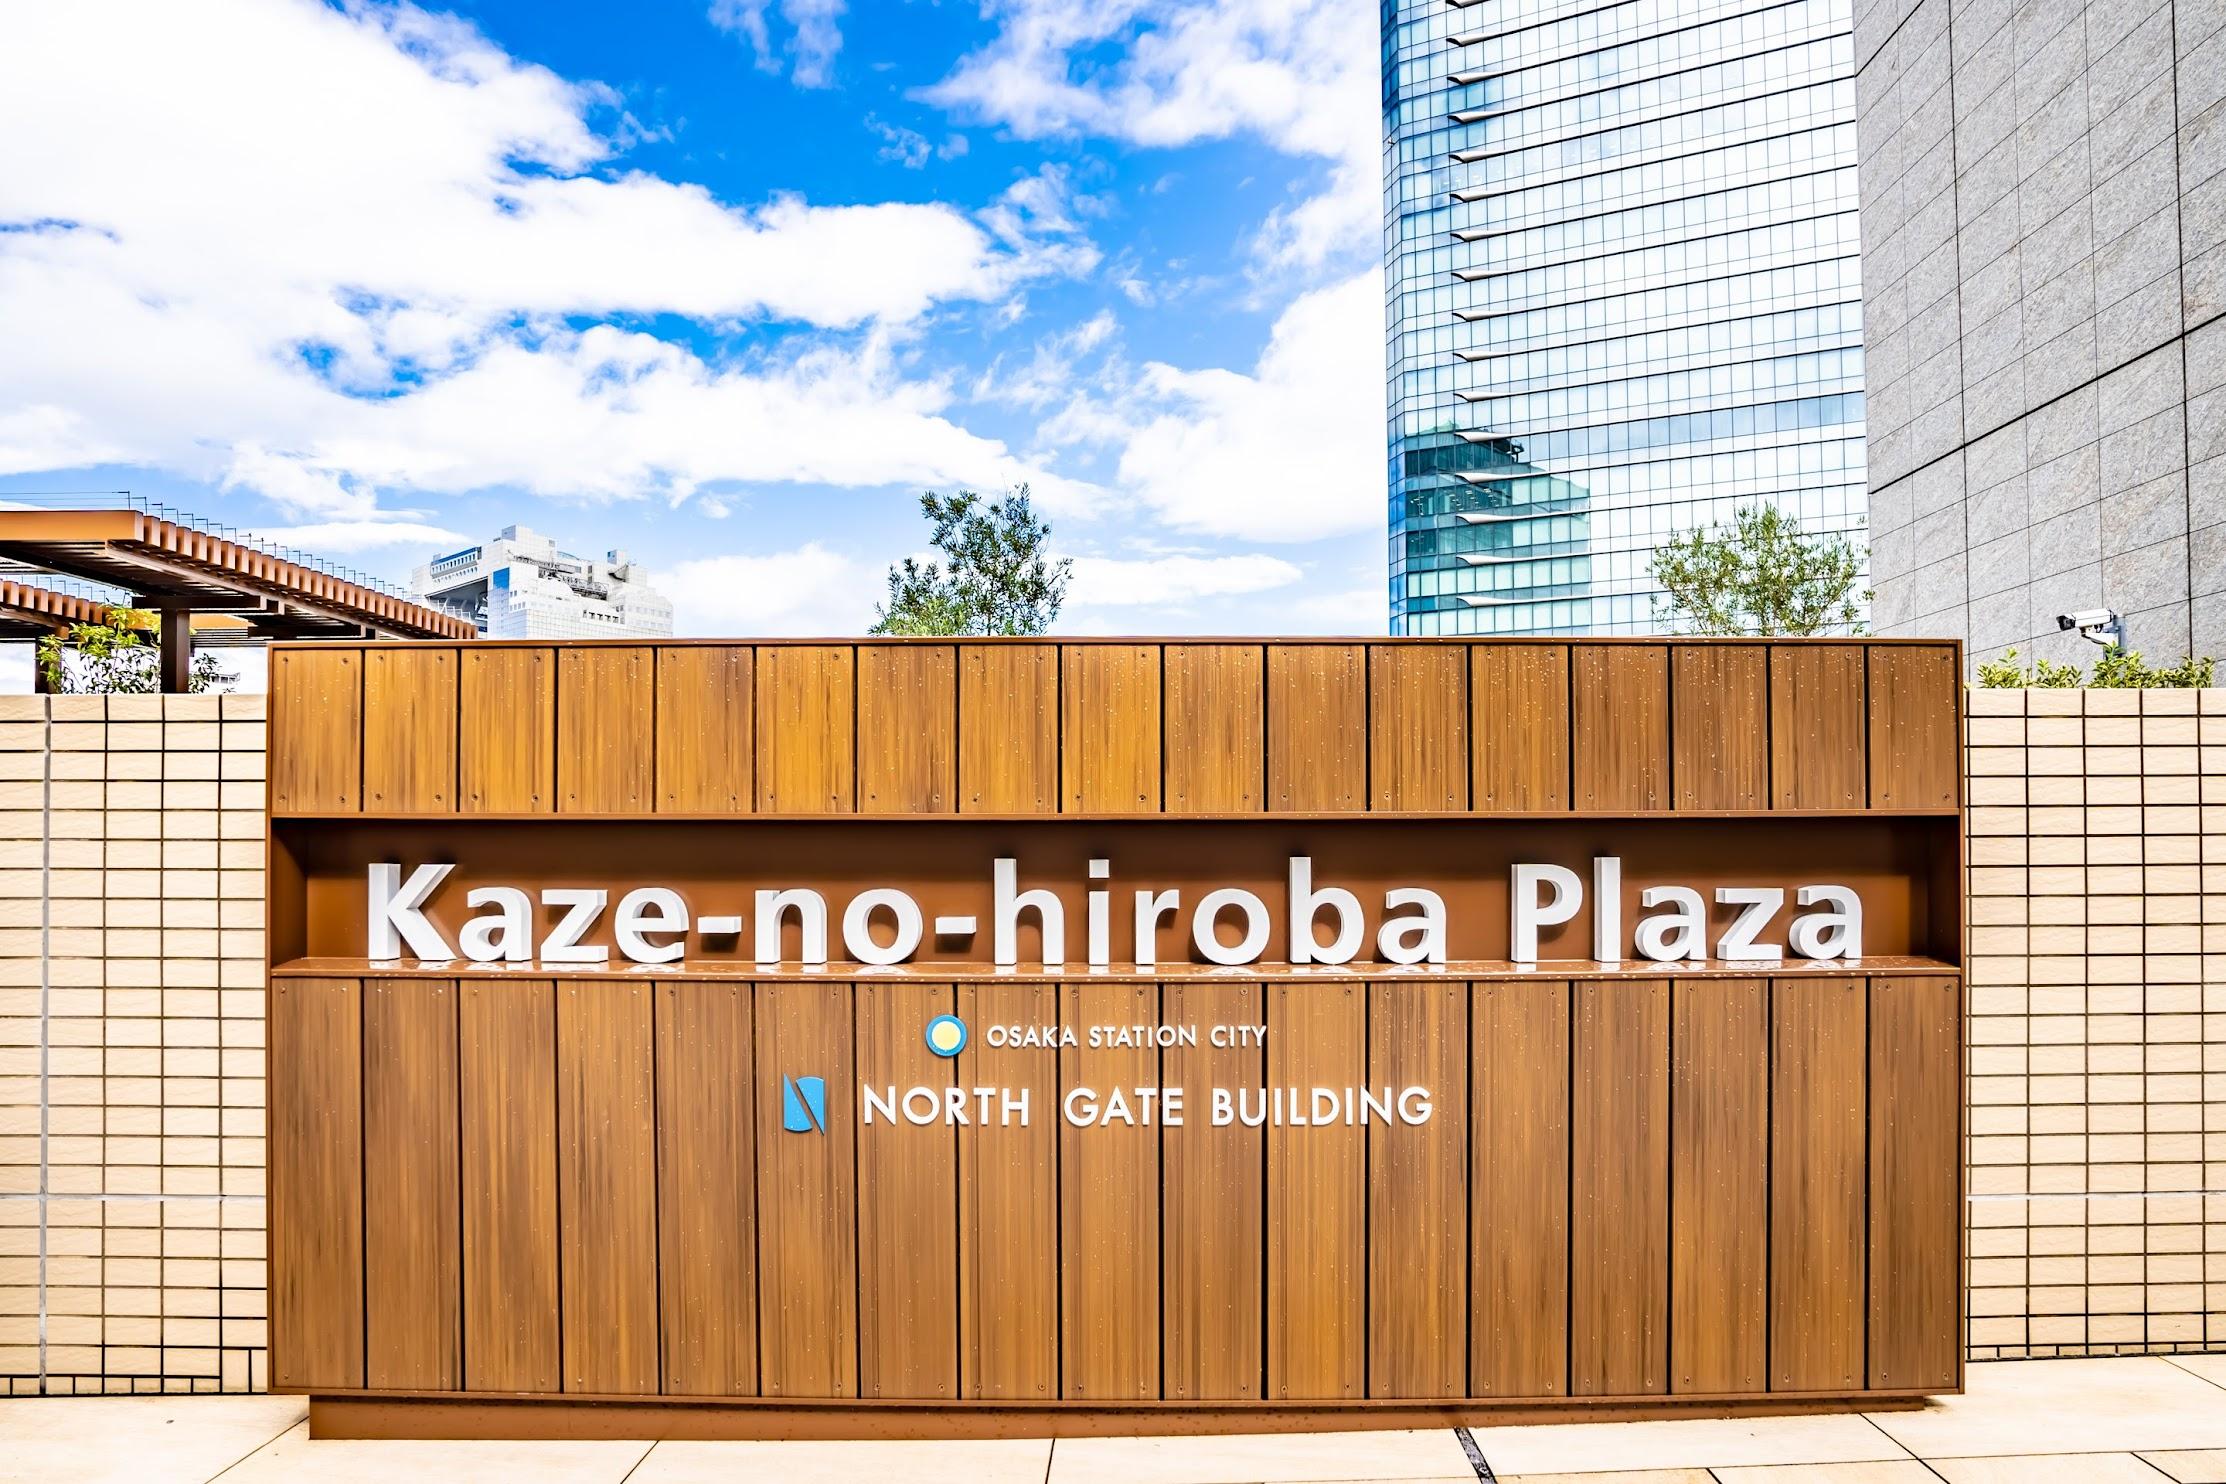 Osaka Station City Kaze-no-hiroba Plaza1